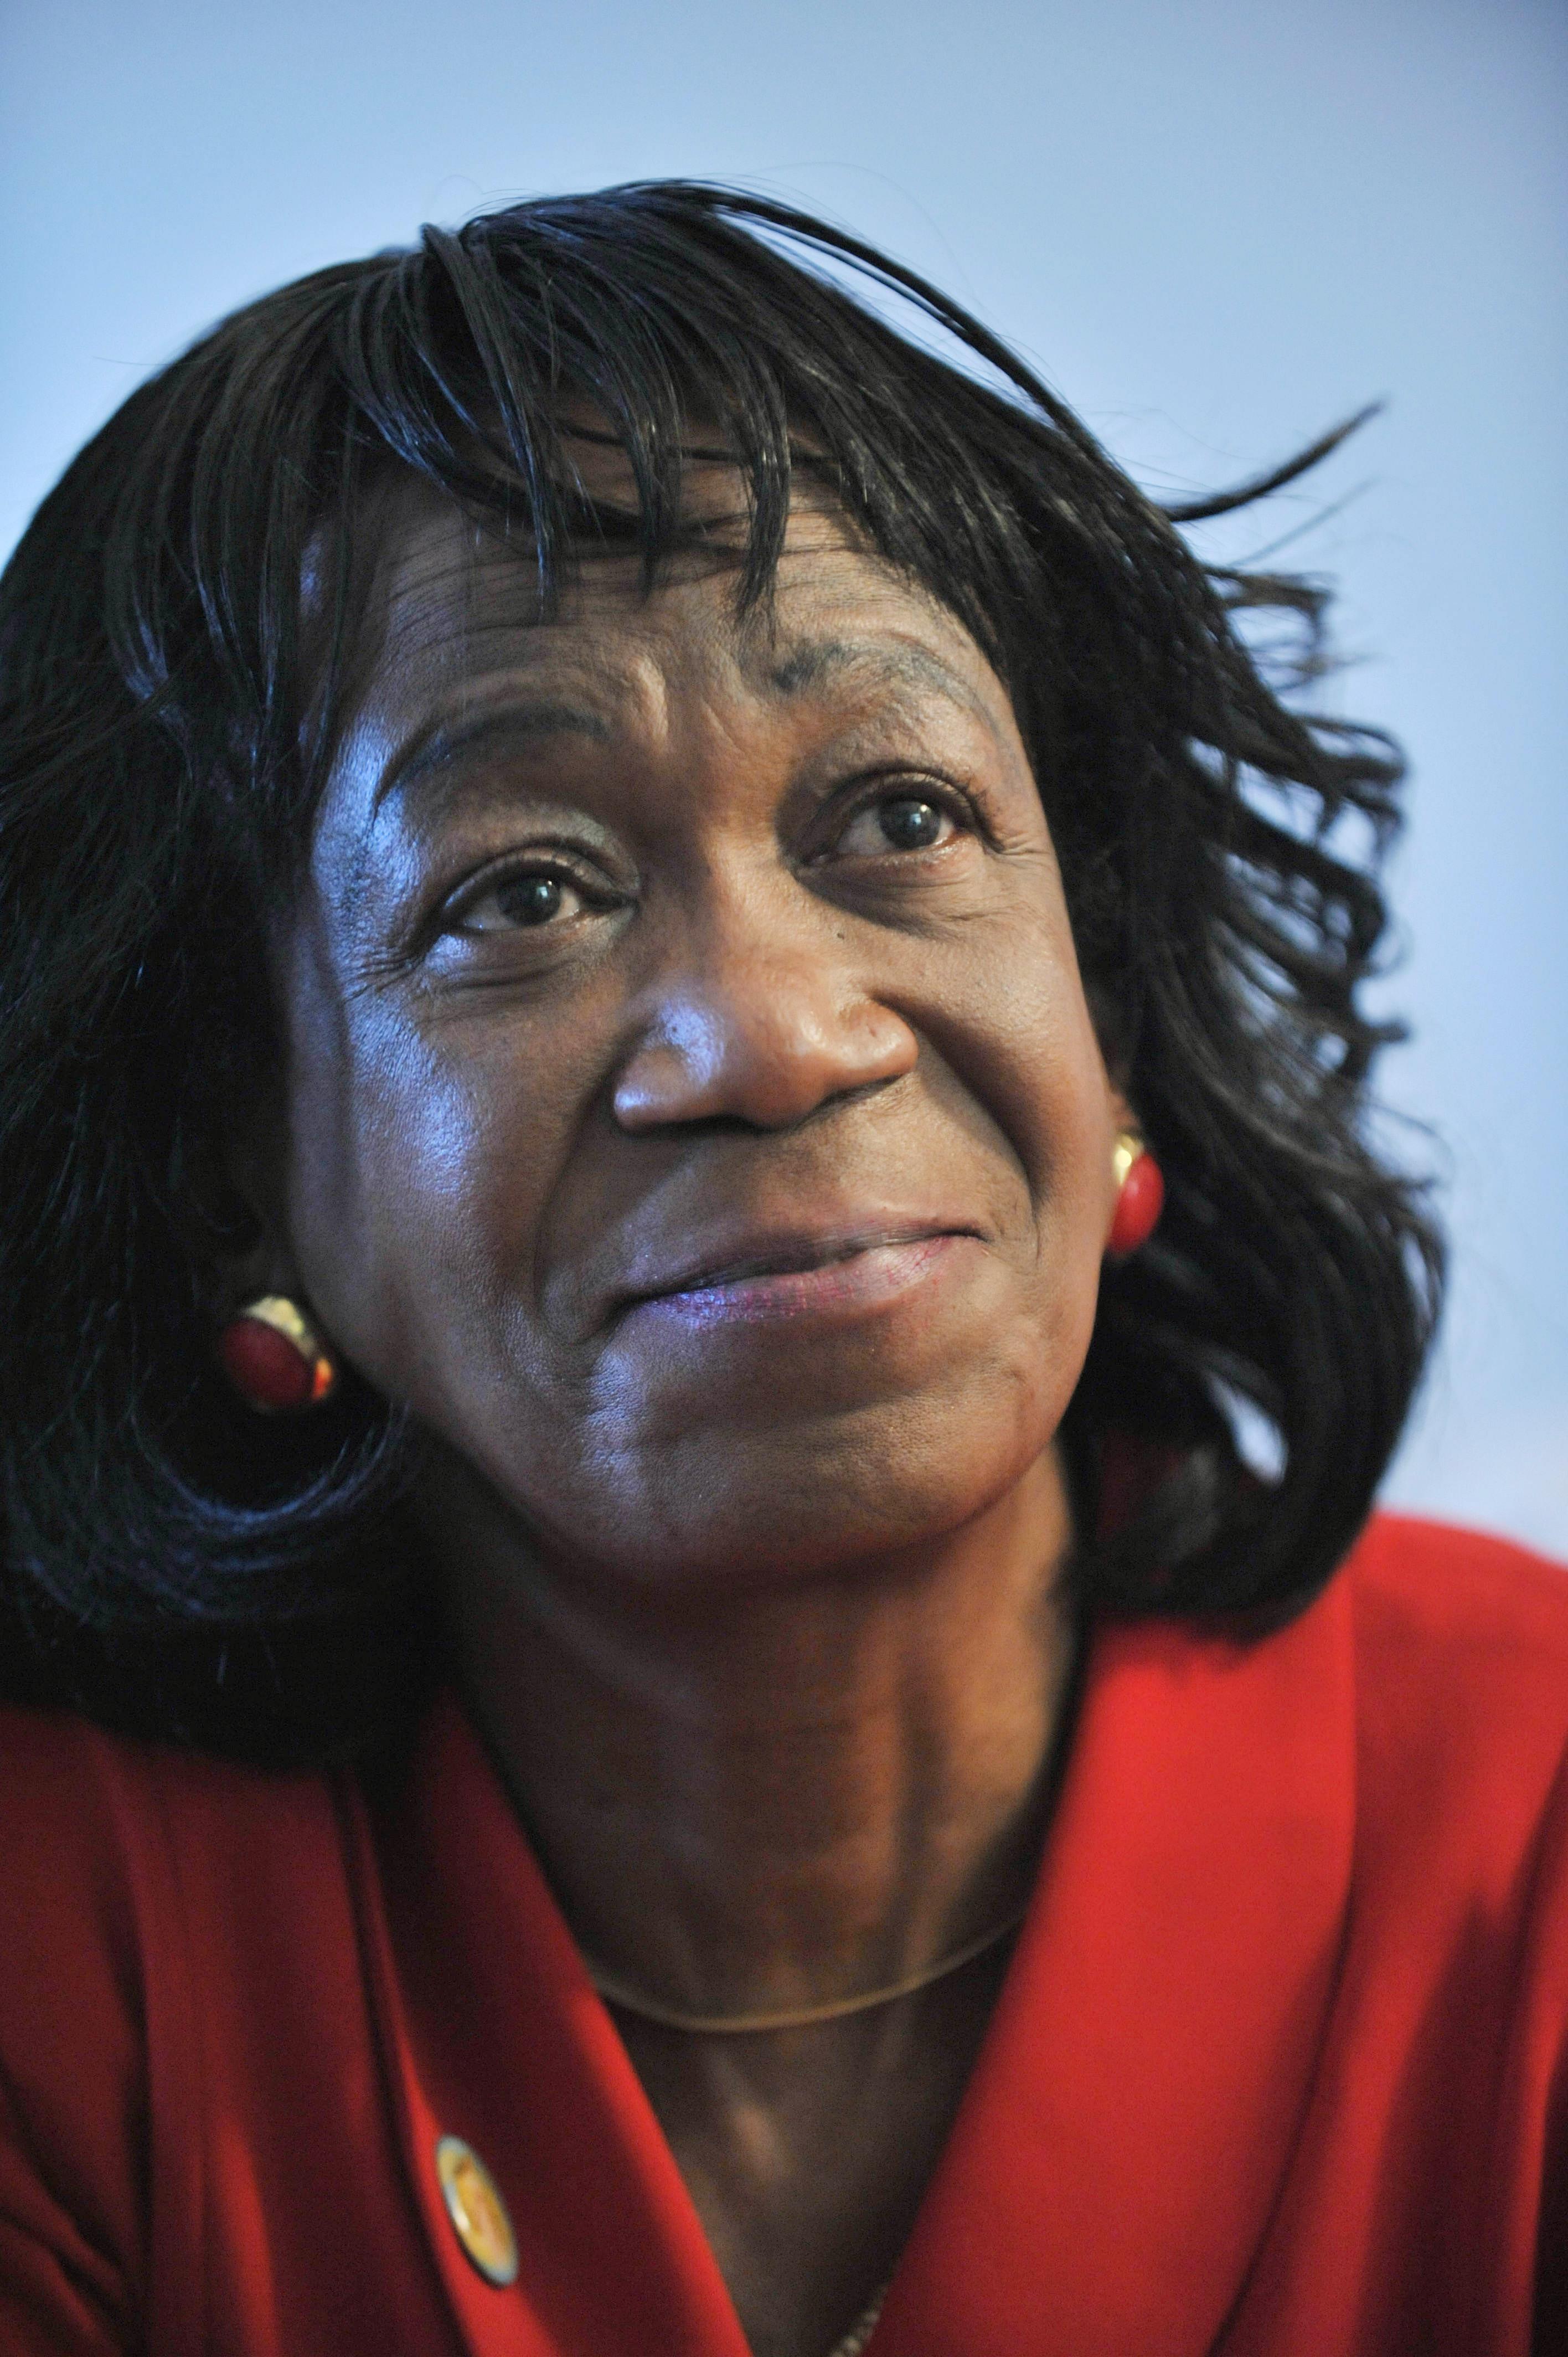 President Obama's aunt, Zeituni Onyango